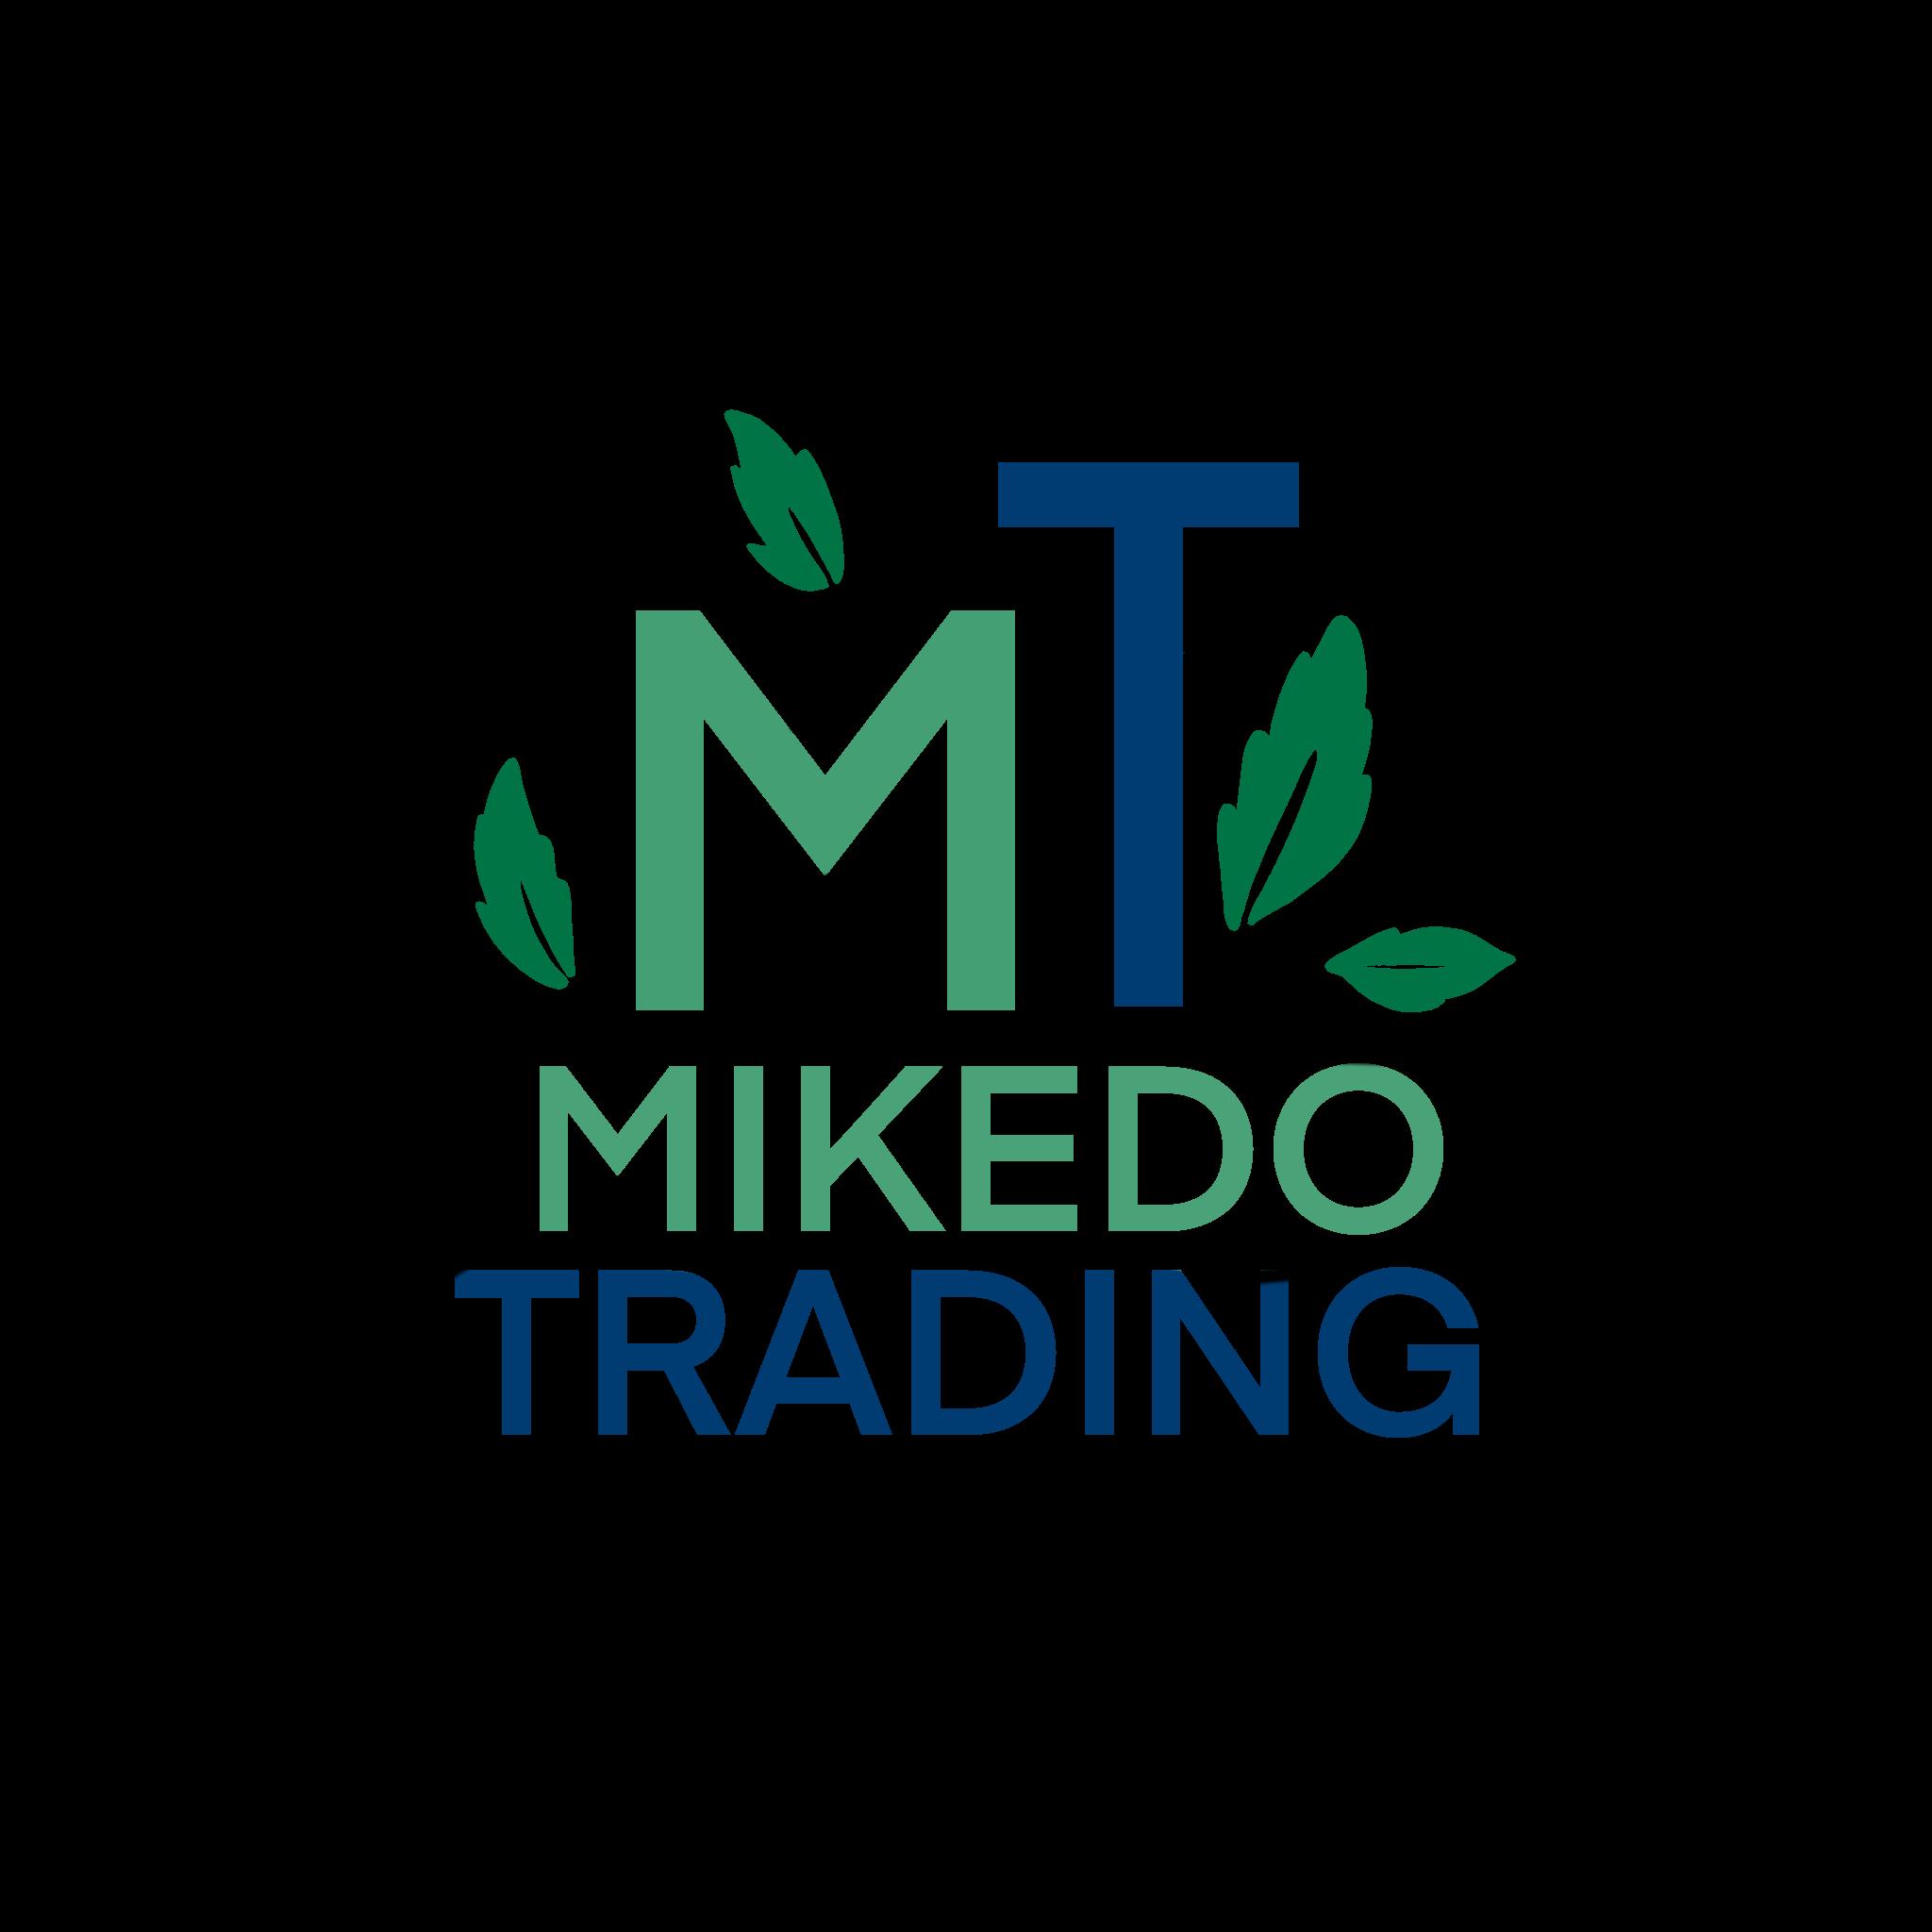 Mikedo Trading